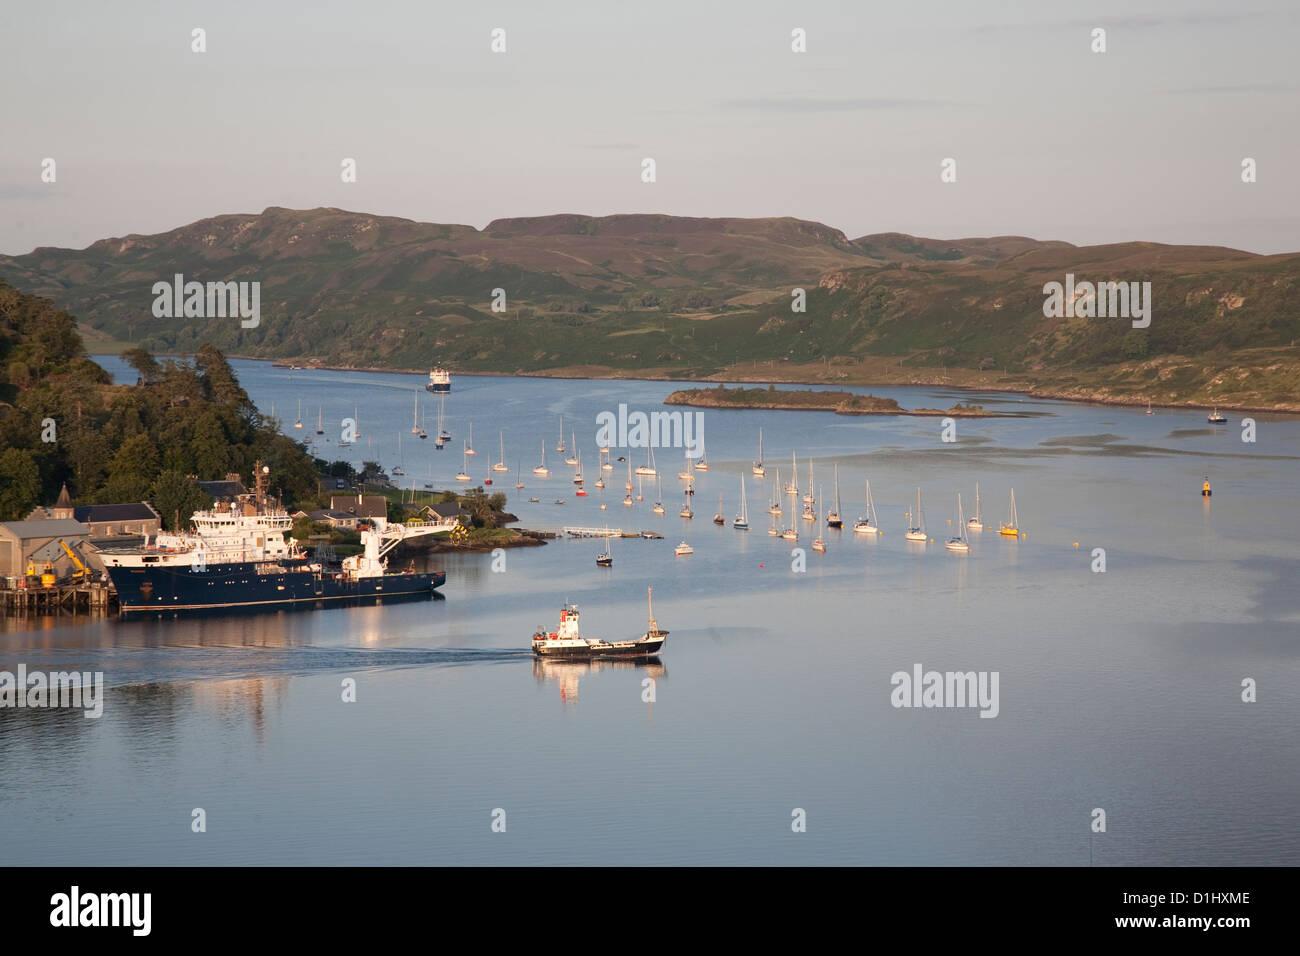 Cal Mac - Caledonian MacBrayne Ferry, Oban, Scotland, UK - Stock Image